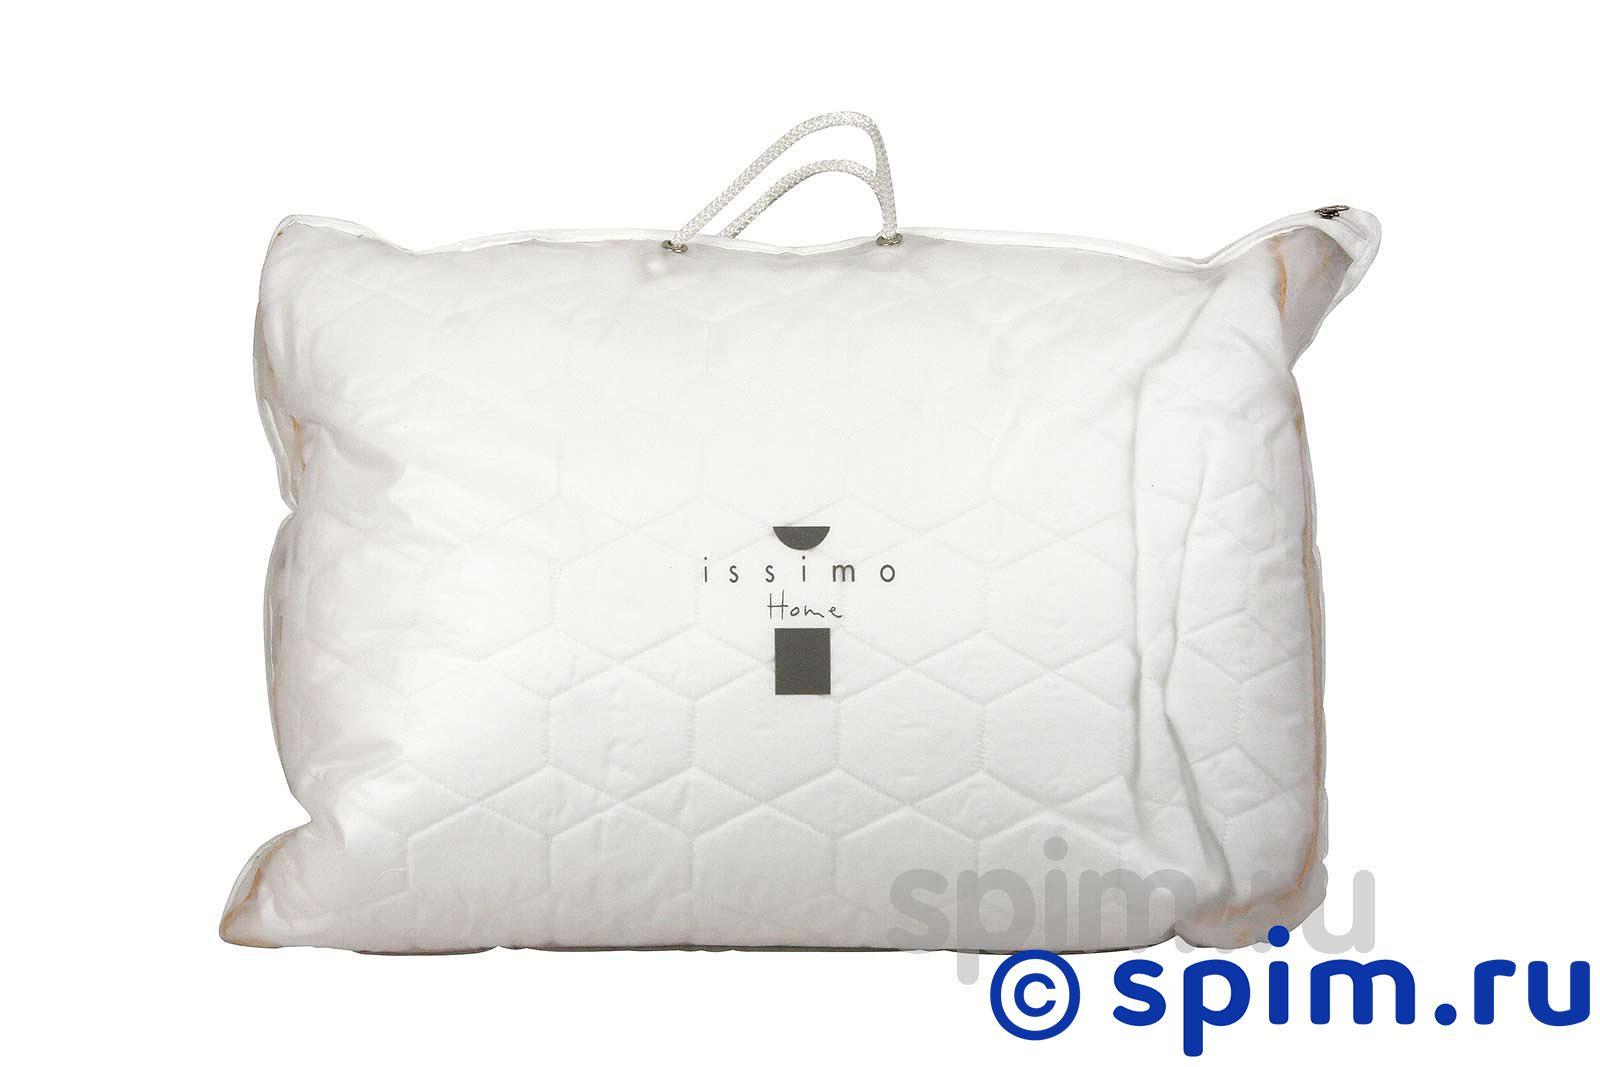 Одеяло Issimo Air Net Quilt Microgel 155х215 см от spim.ru